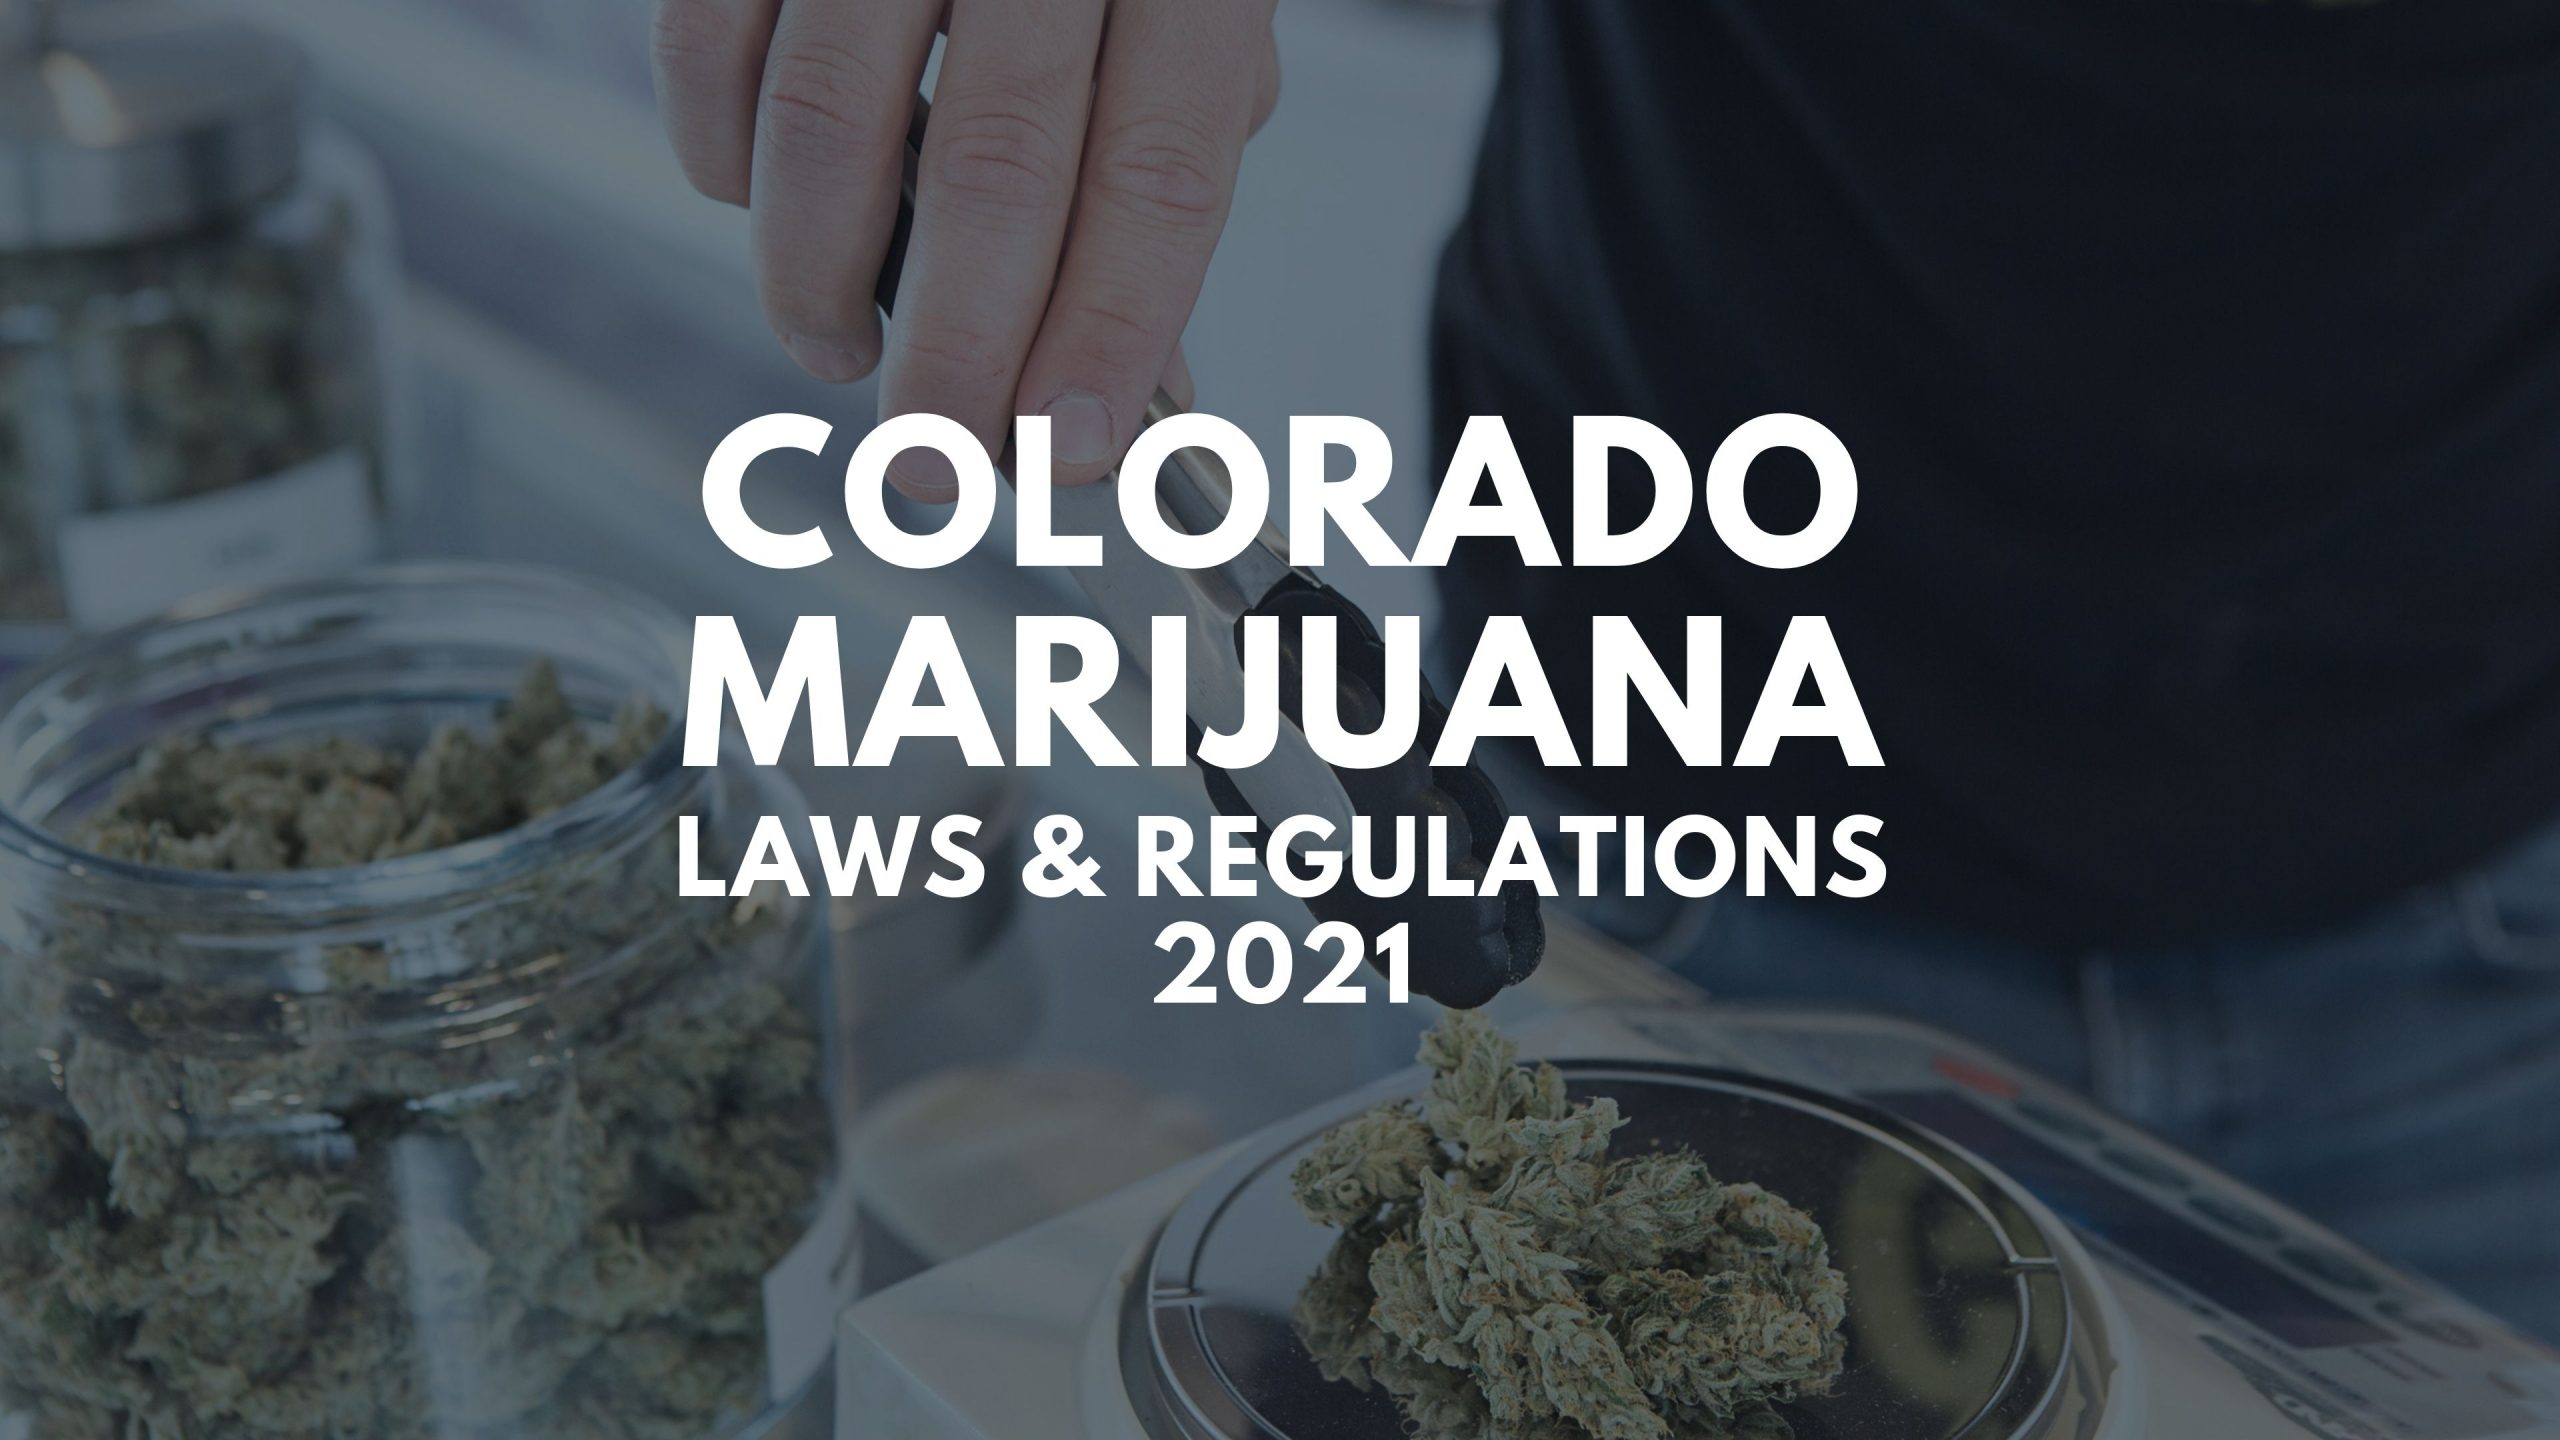 Colorado Marijuana Laws and regulations